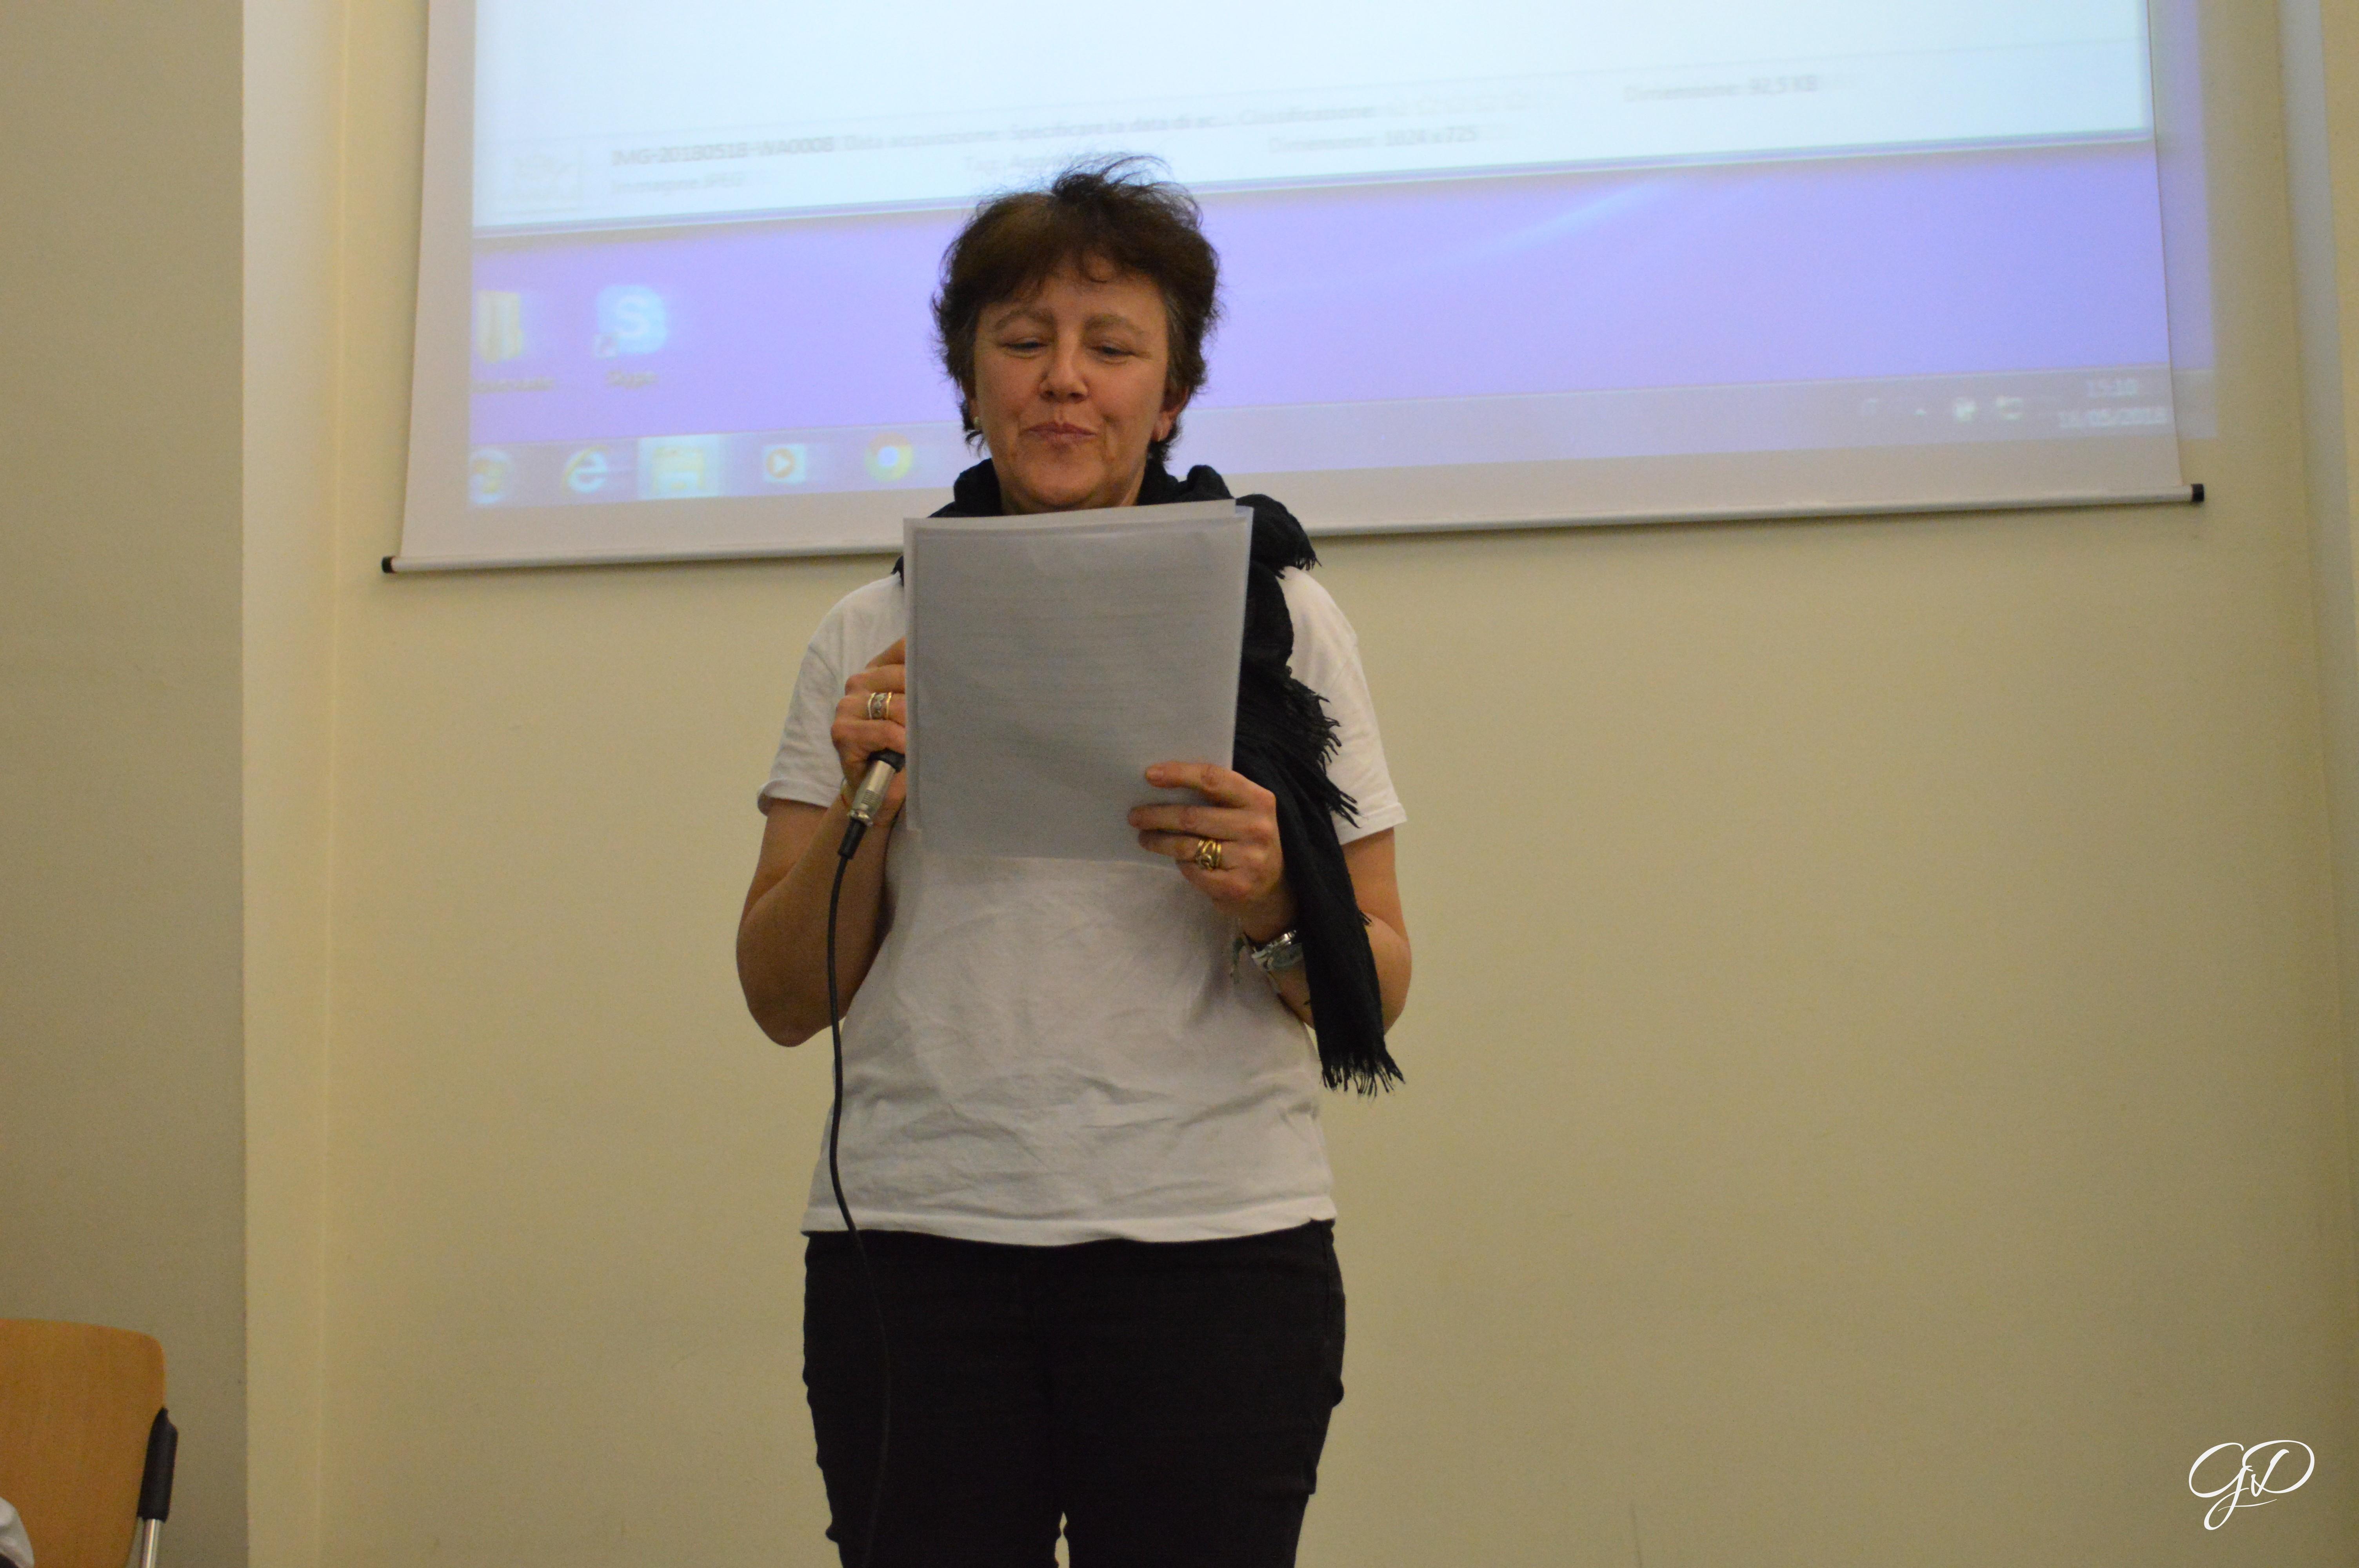 La professoressa Bianchi